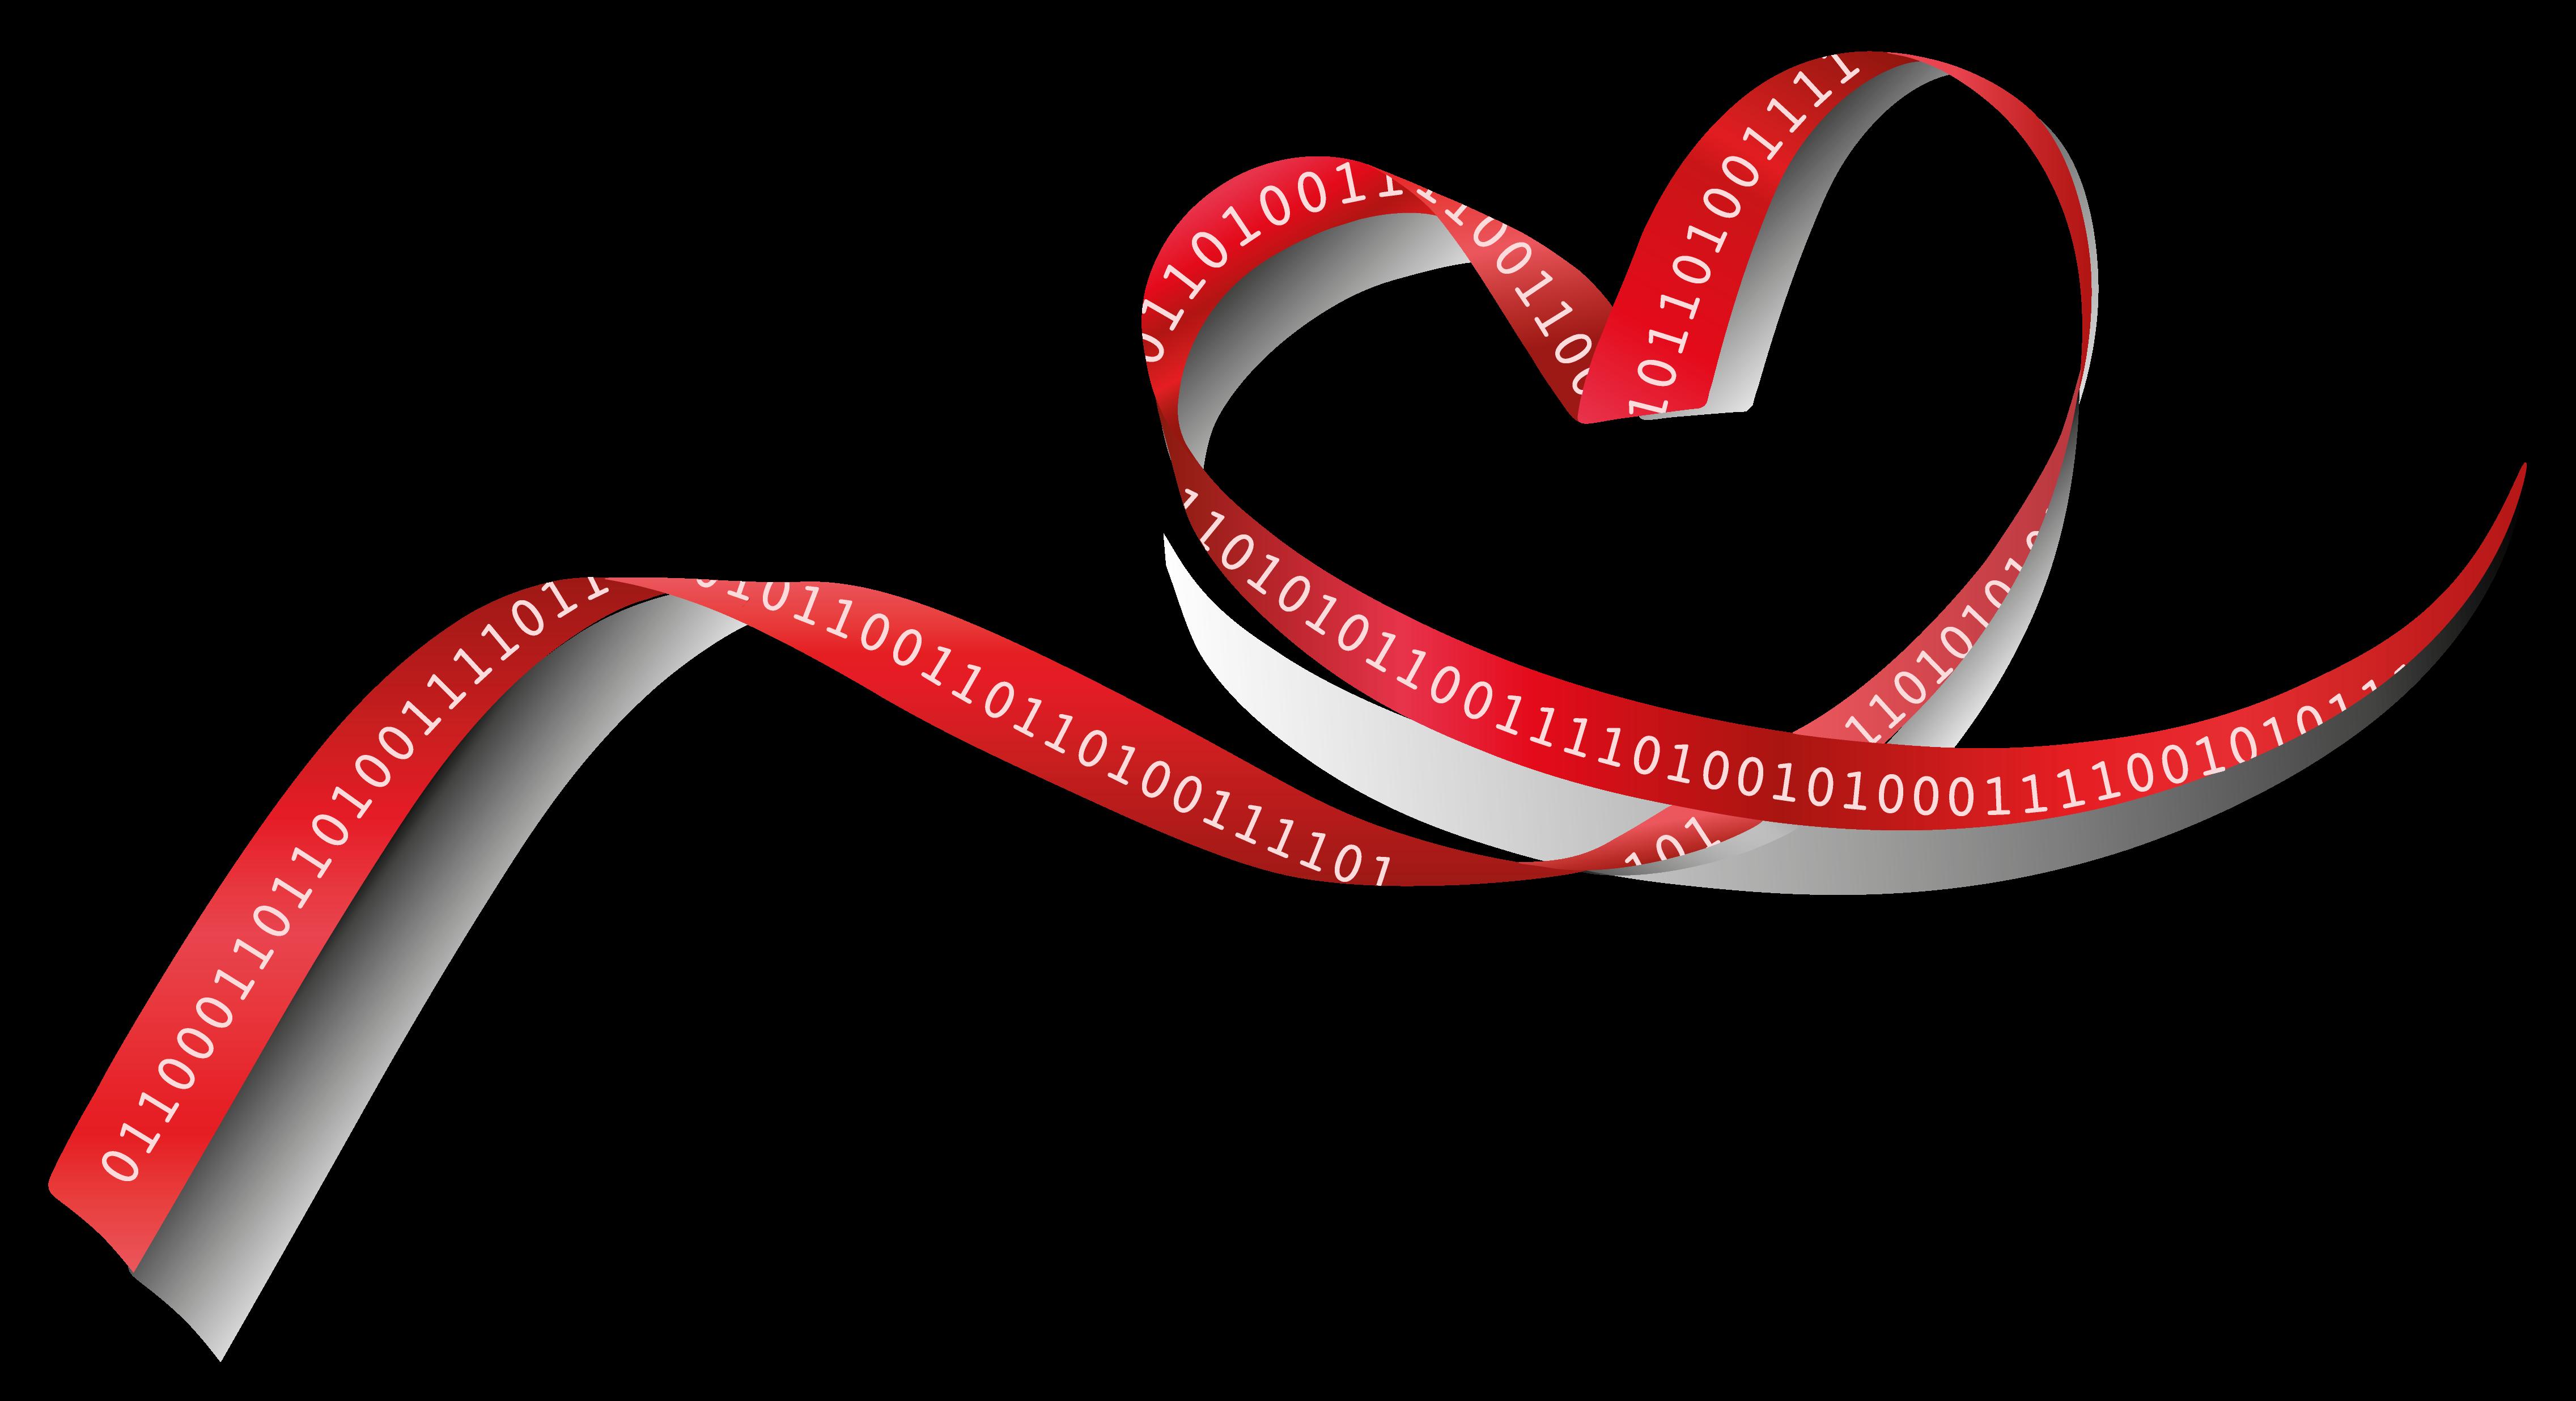 BigData@Heart logo